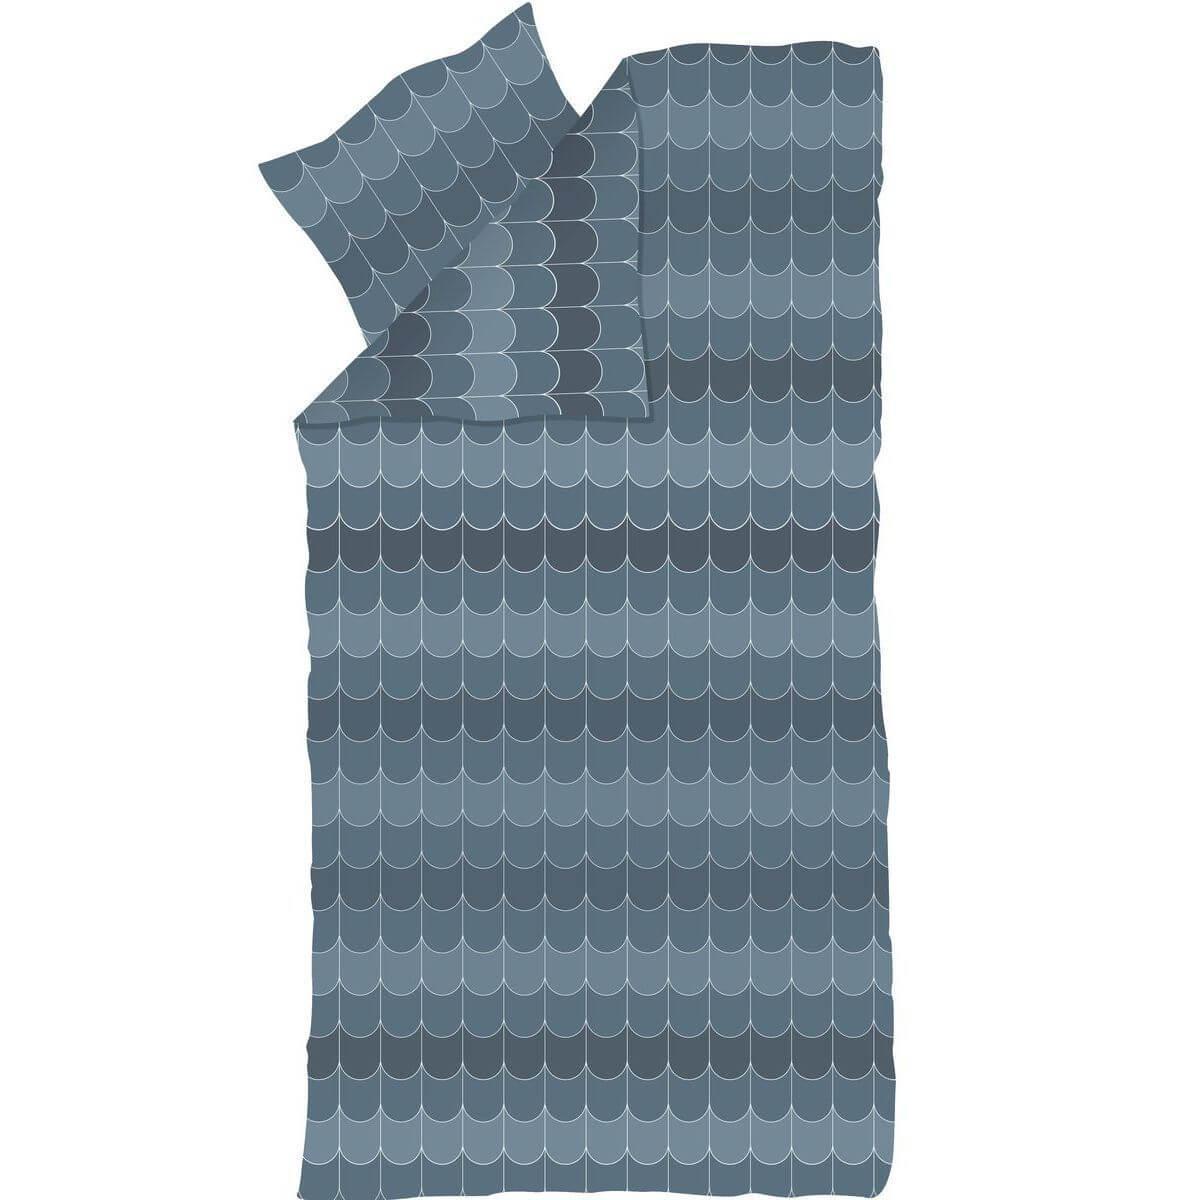 Funda nórdica 140x200cm-almohada 80x80cm POPSICLE Flexa blueberry